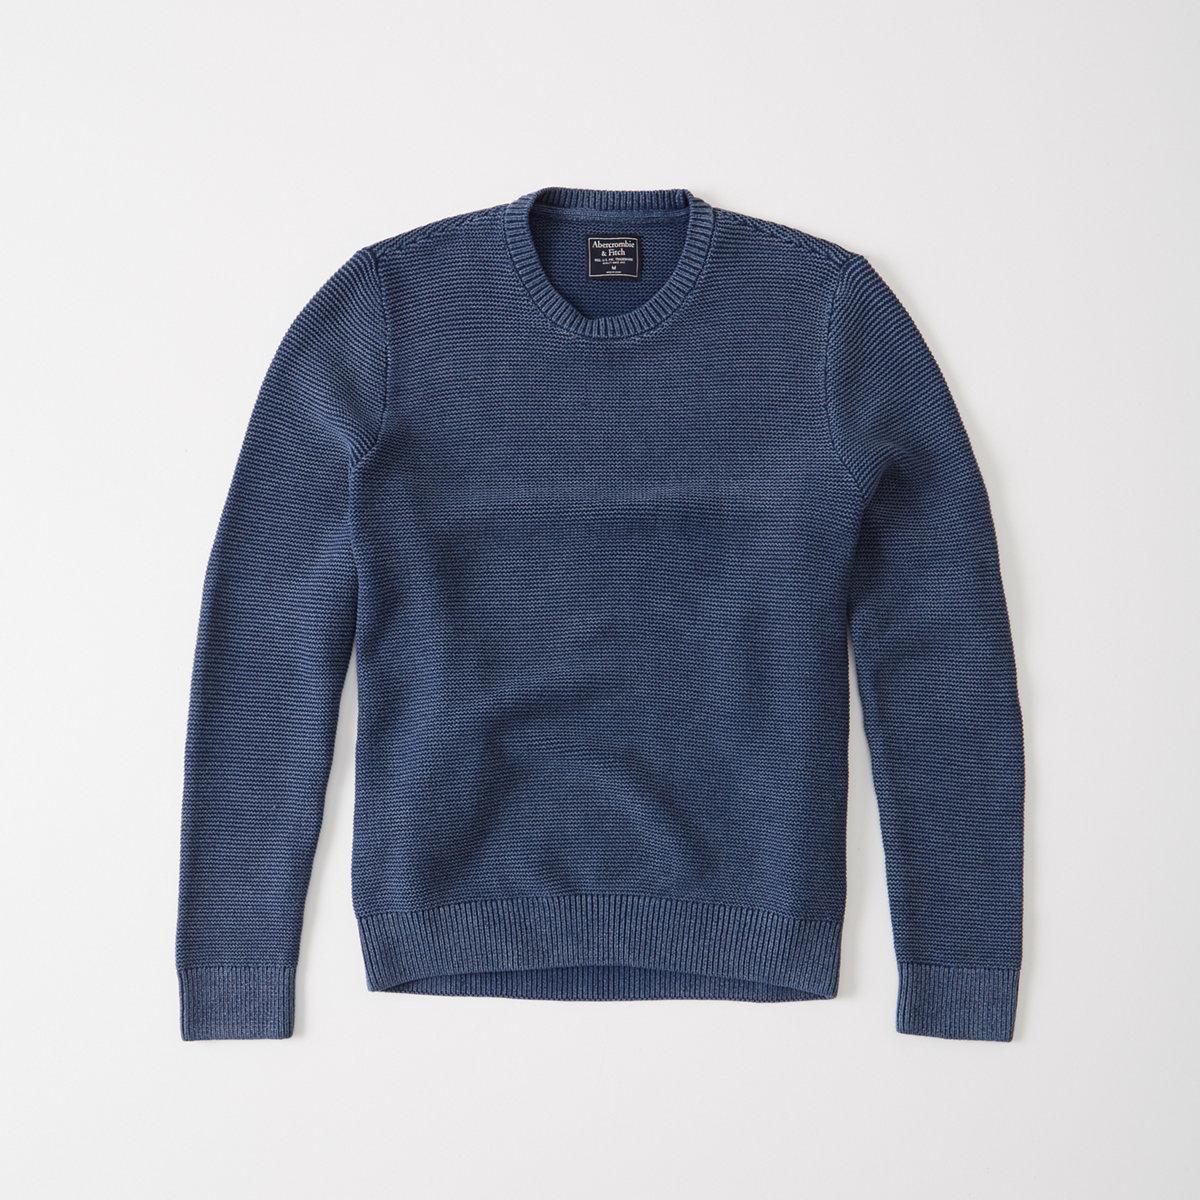 Stitched Crew Sweater